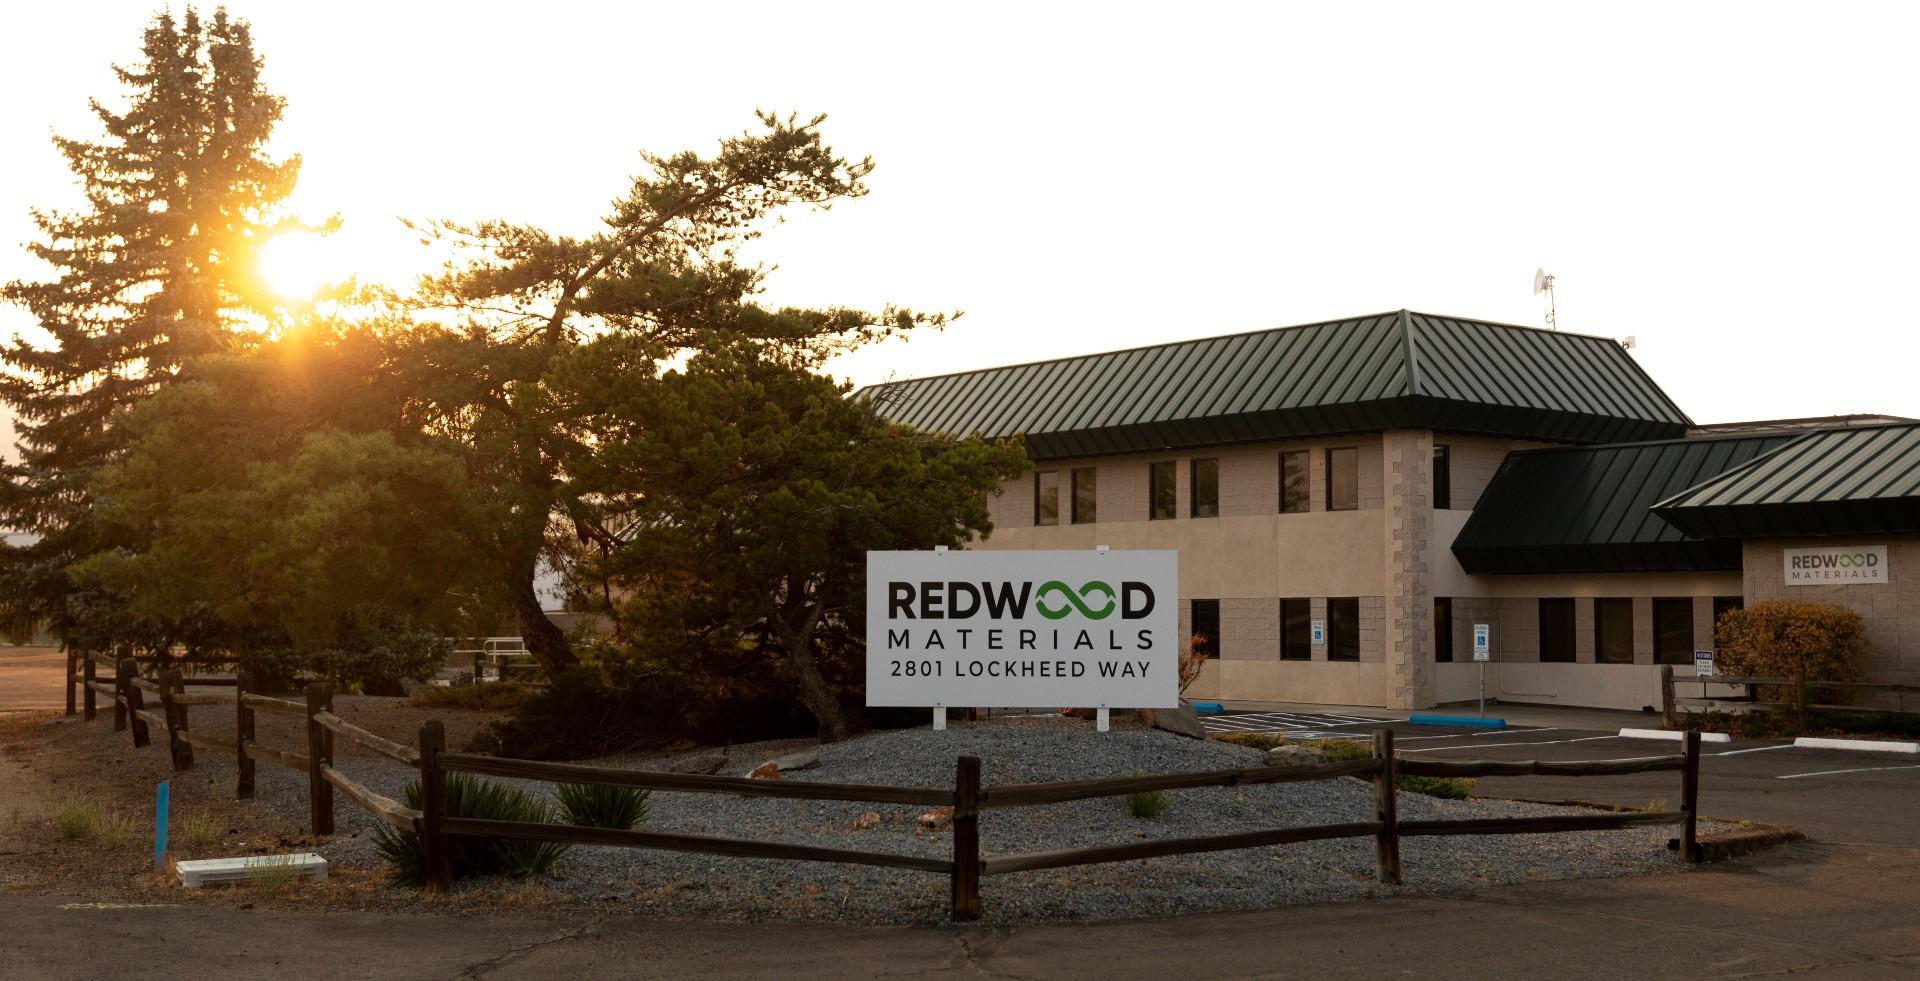 Redwood Materials